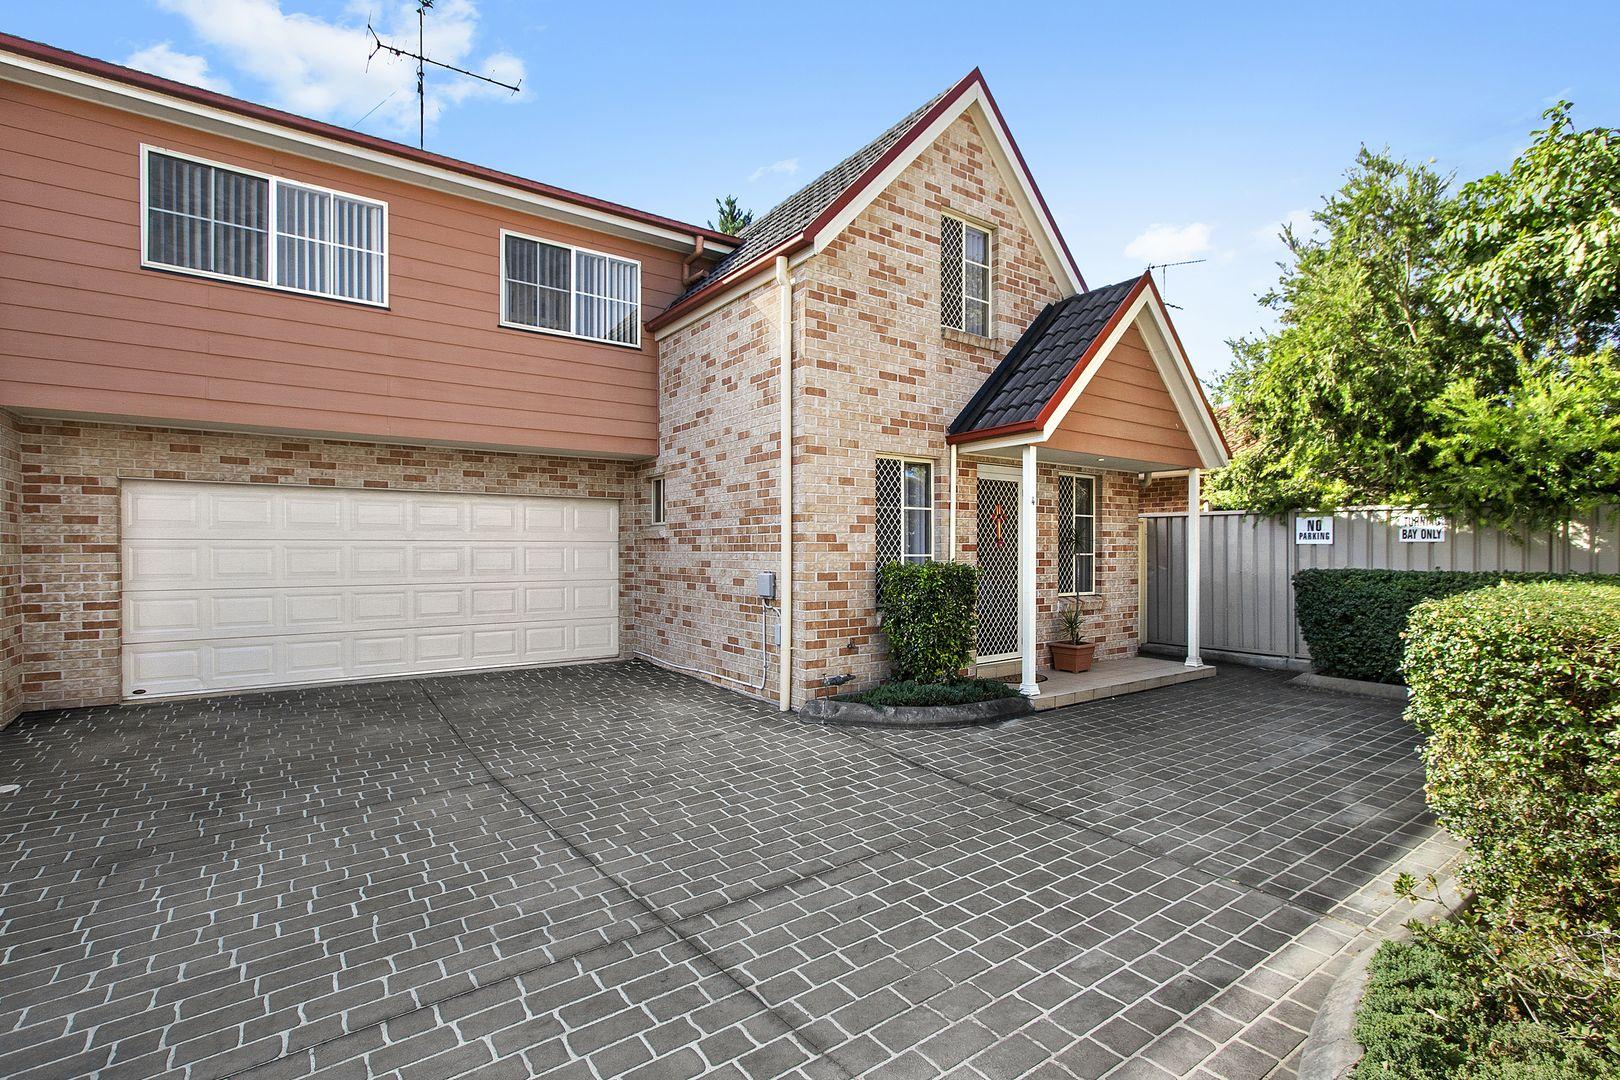 4/43 Lennox Street, Richmond NSW 2753, Image 0